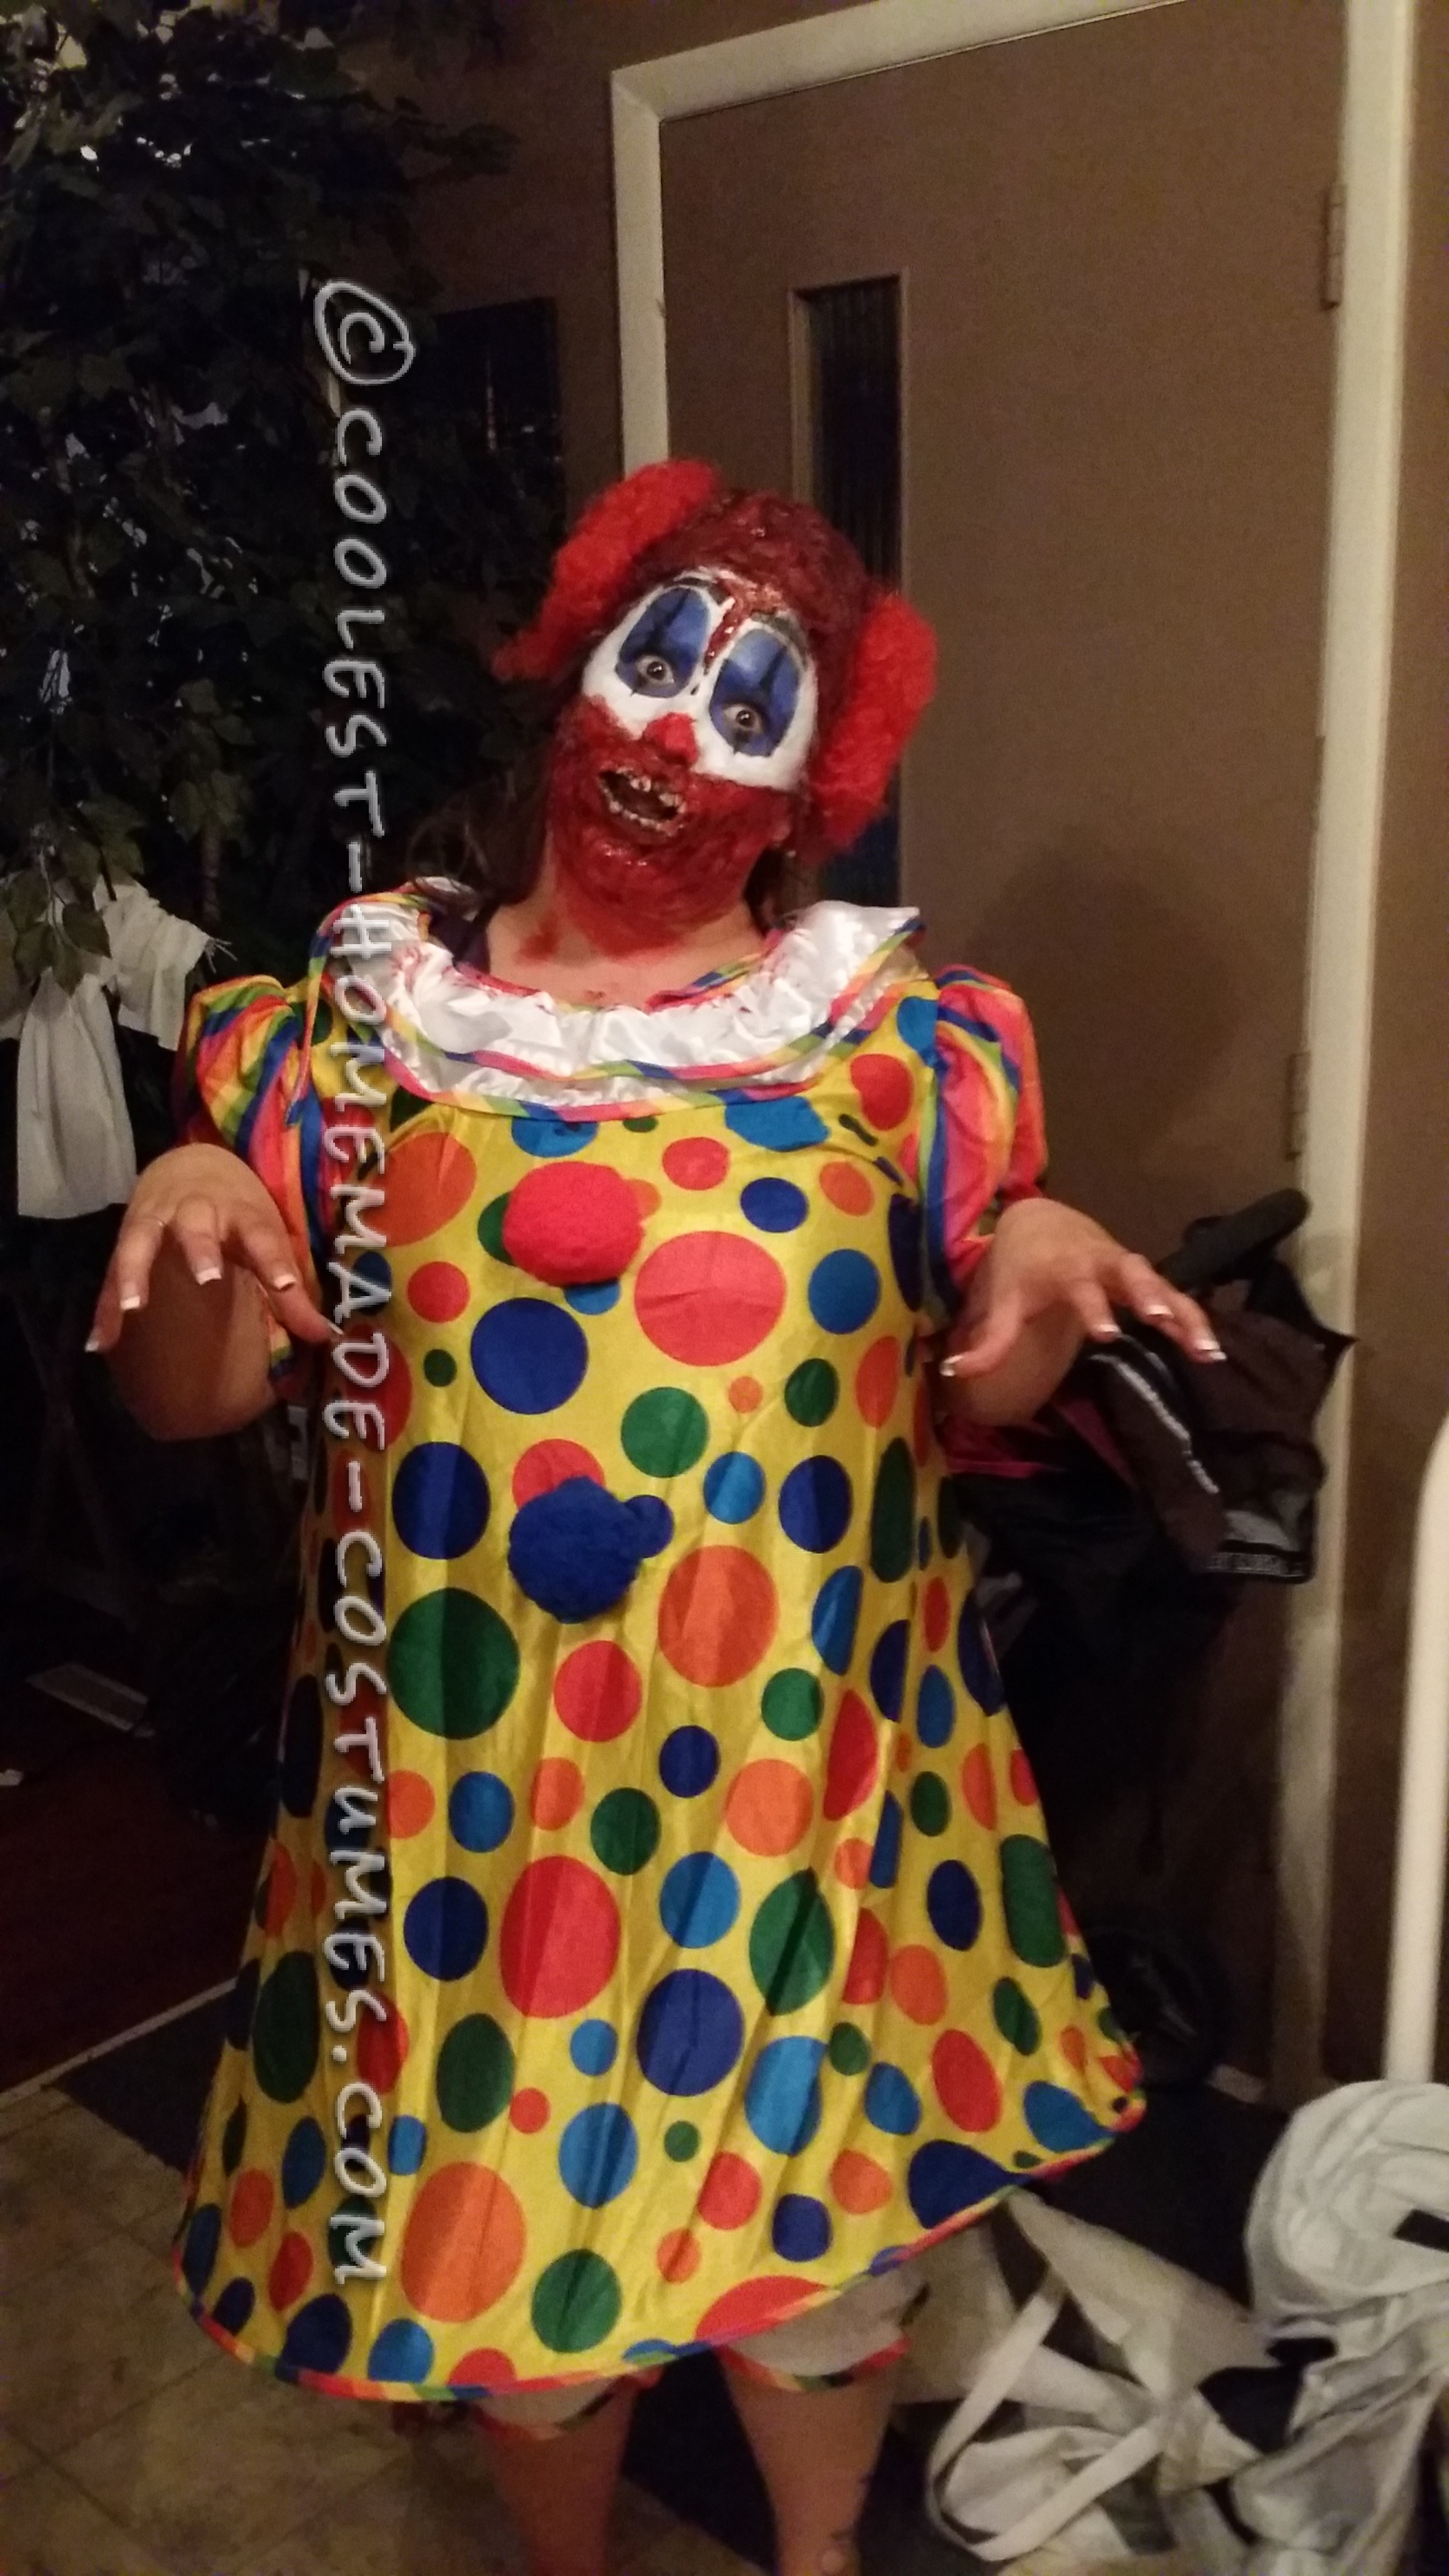 Creepy Homemade Clown Costume